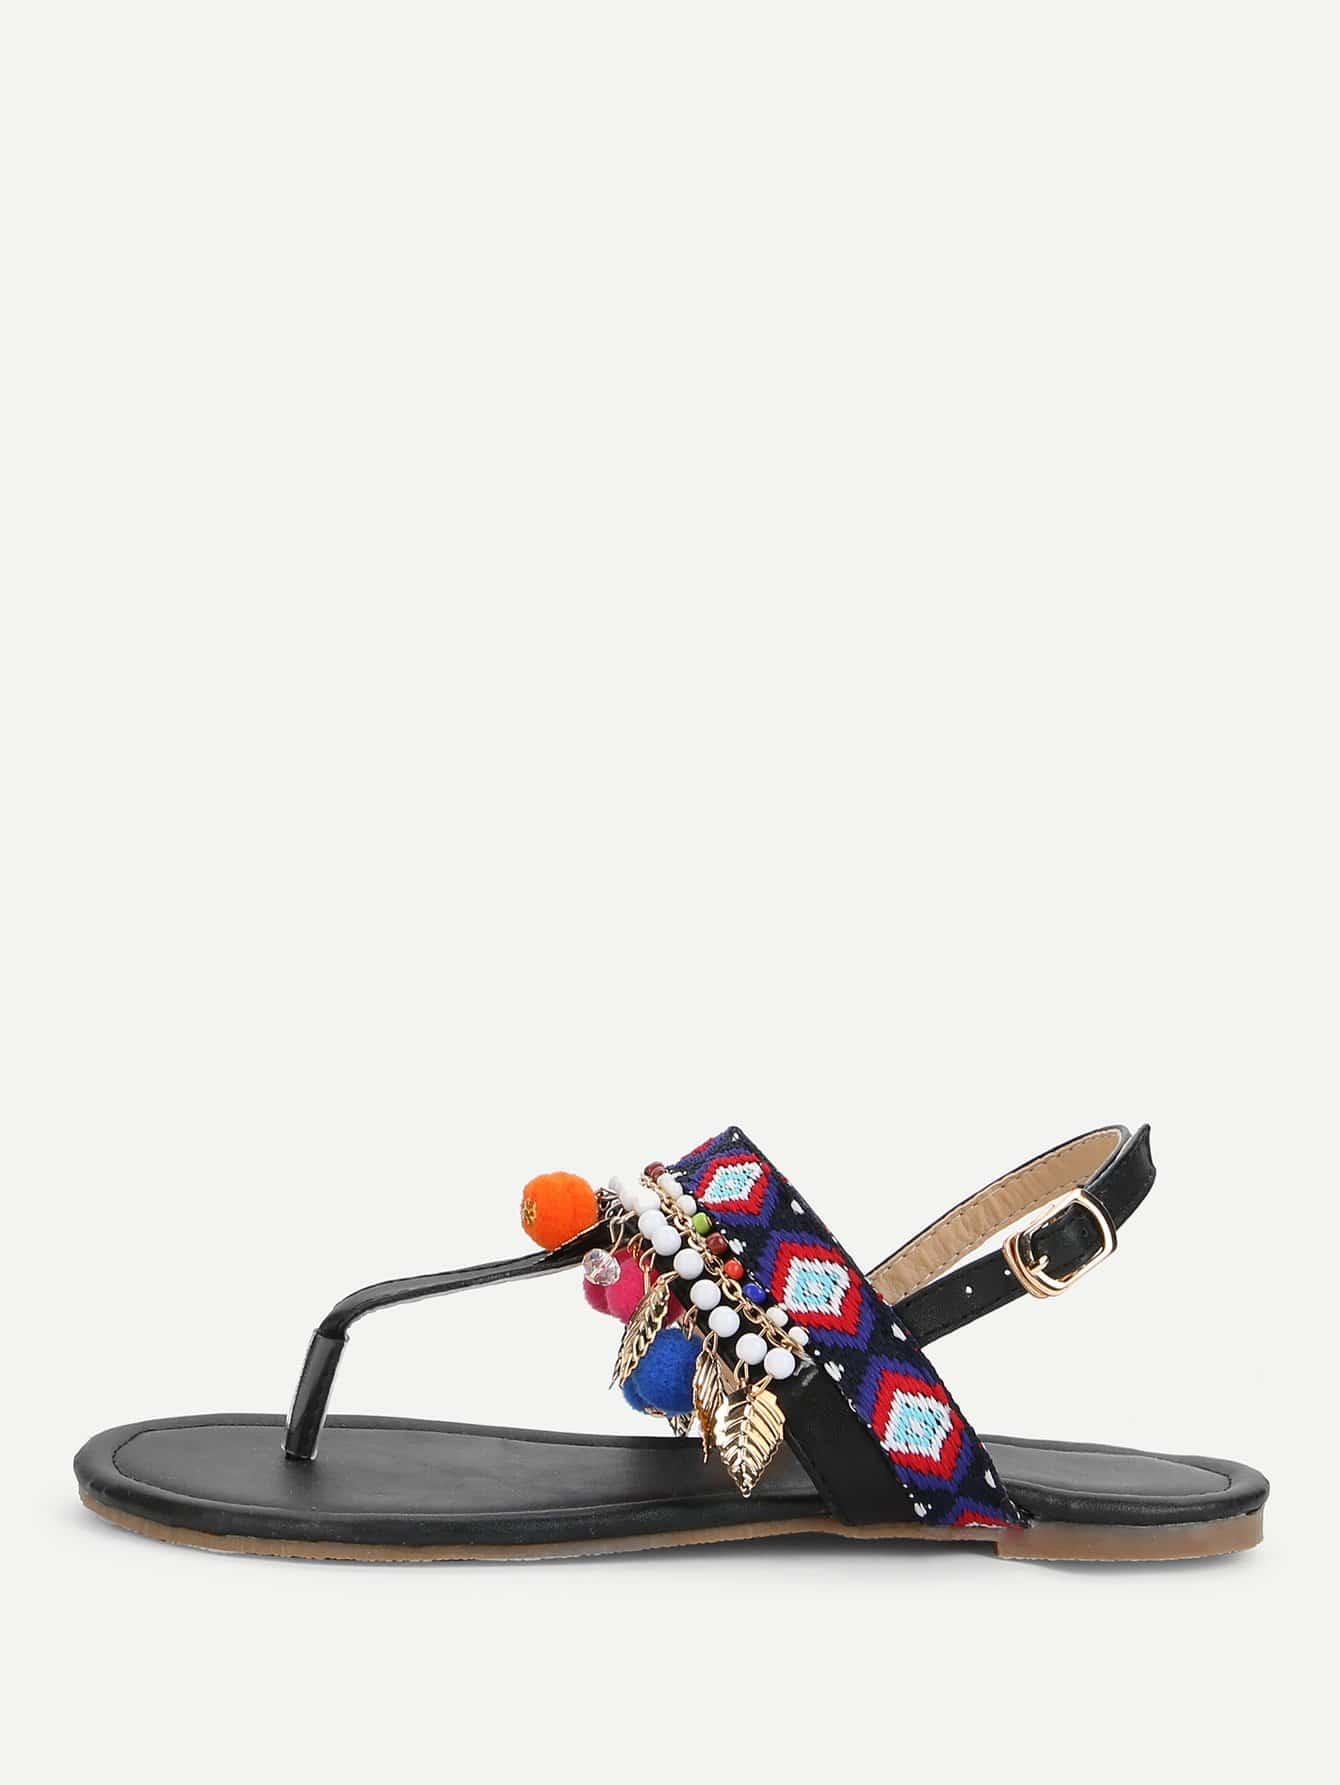 Pom Pom Decorated Toe Post Flat Sandals rose decorated toe post flat sandals